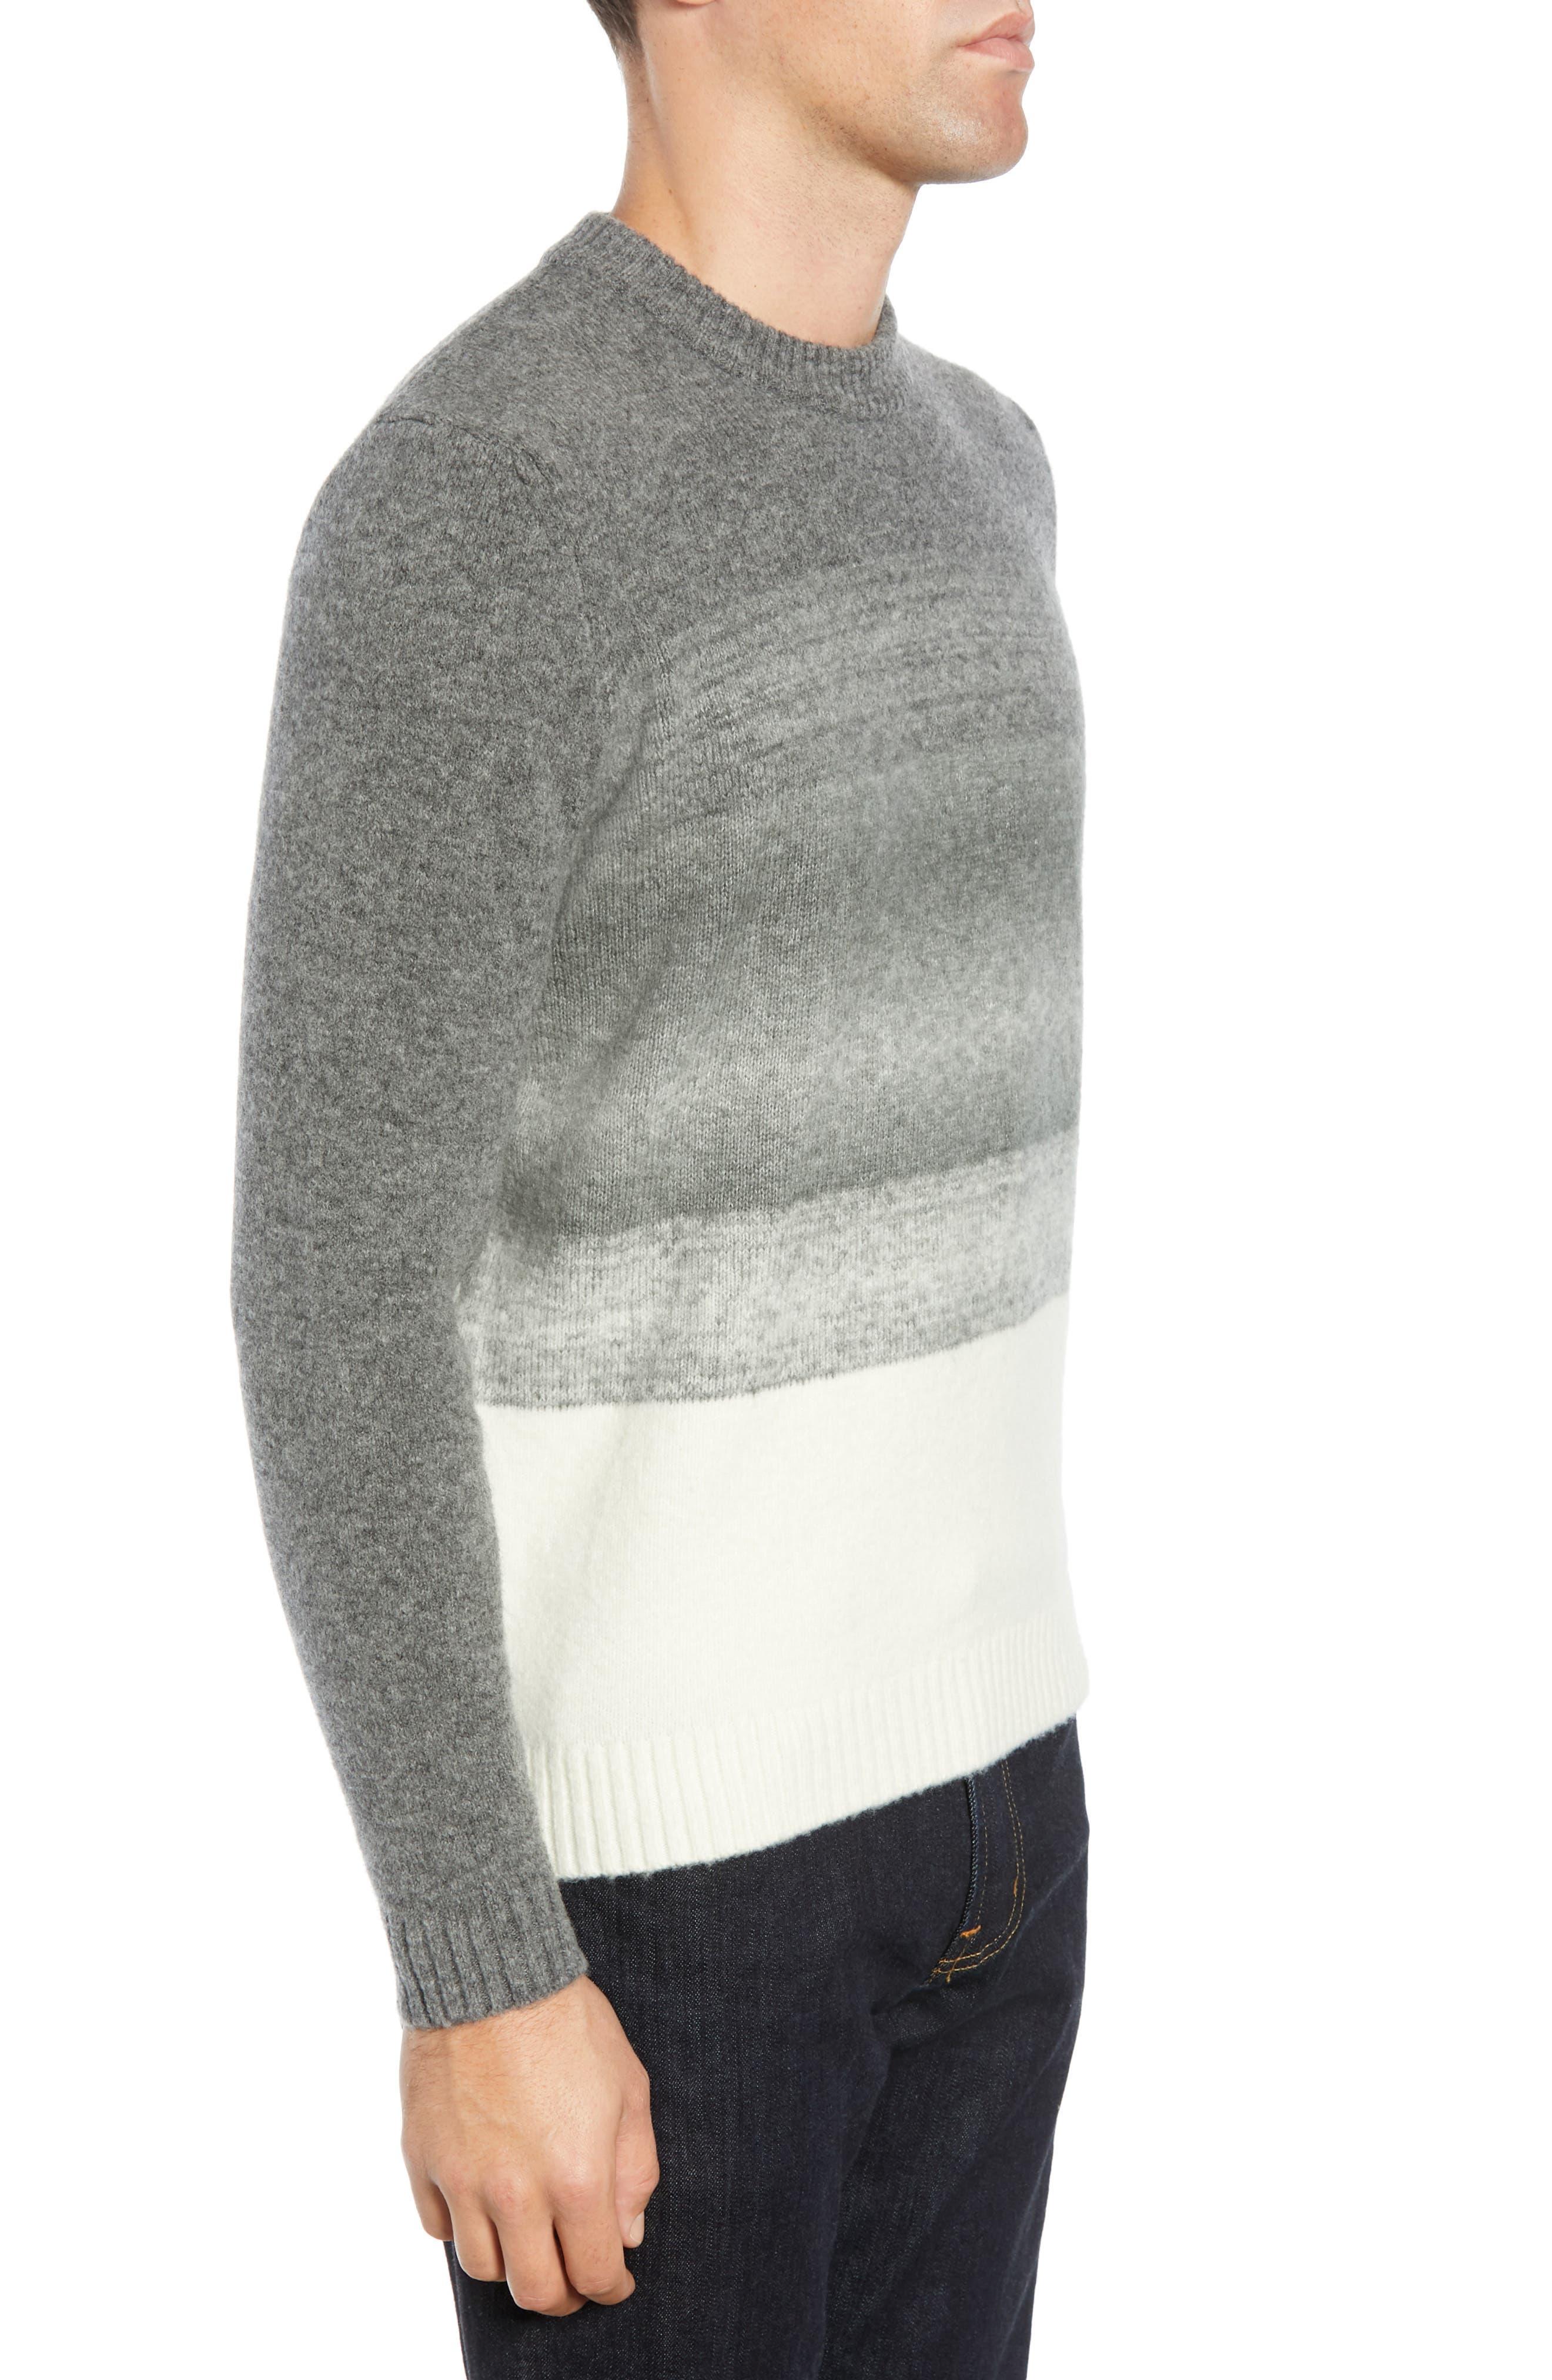 Ecardo Dégradé Virgin Wool Blend Sweater,                             Alternate thumbnail 3, color,                             GREY